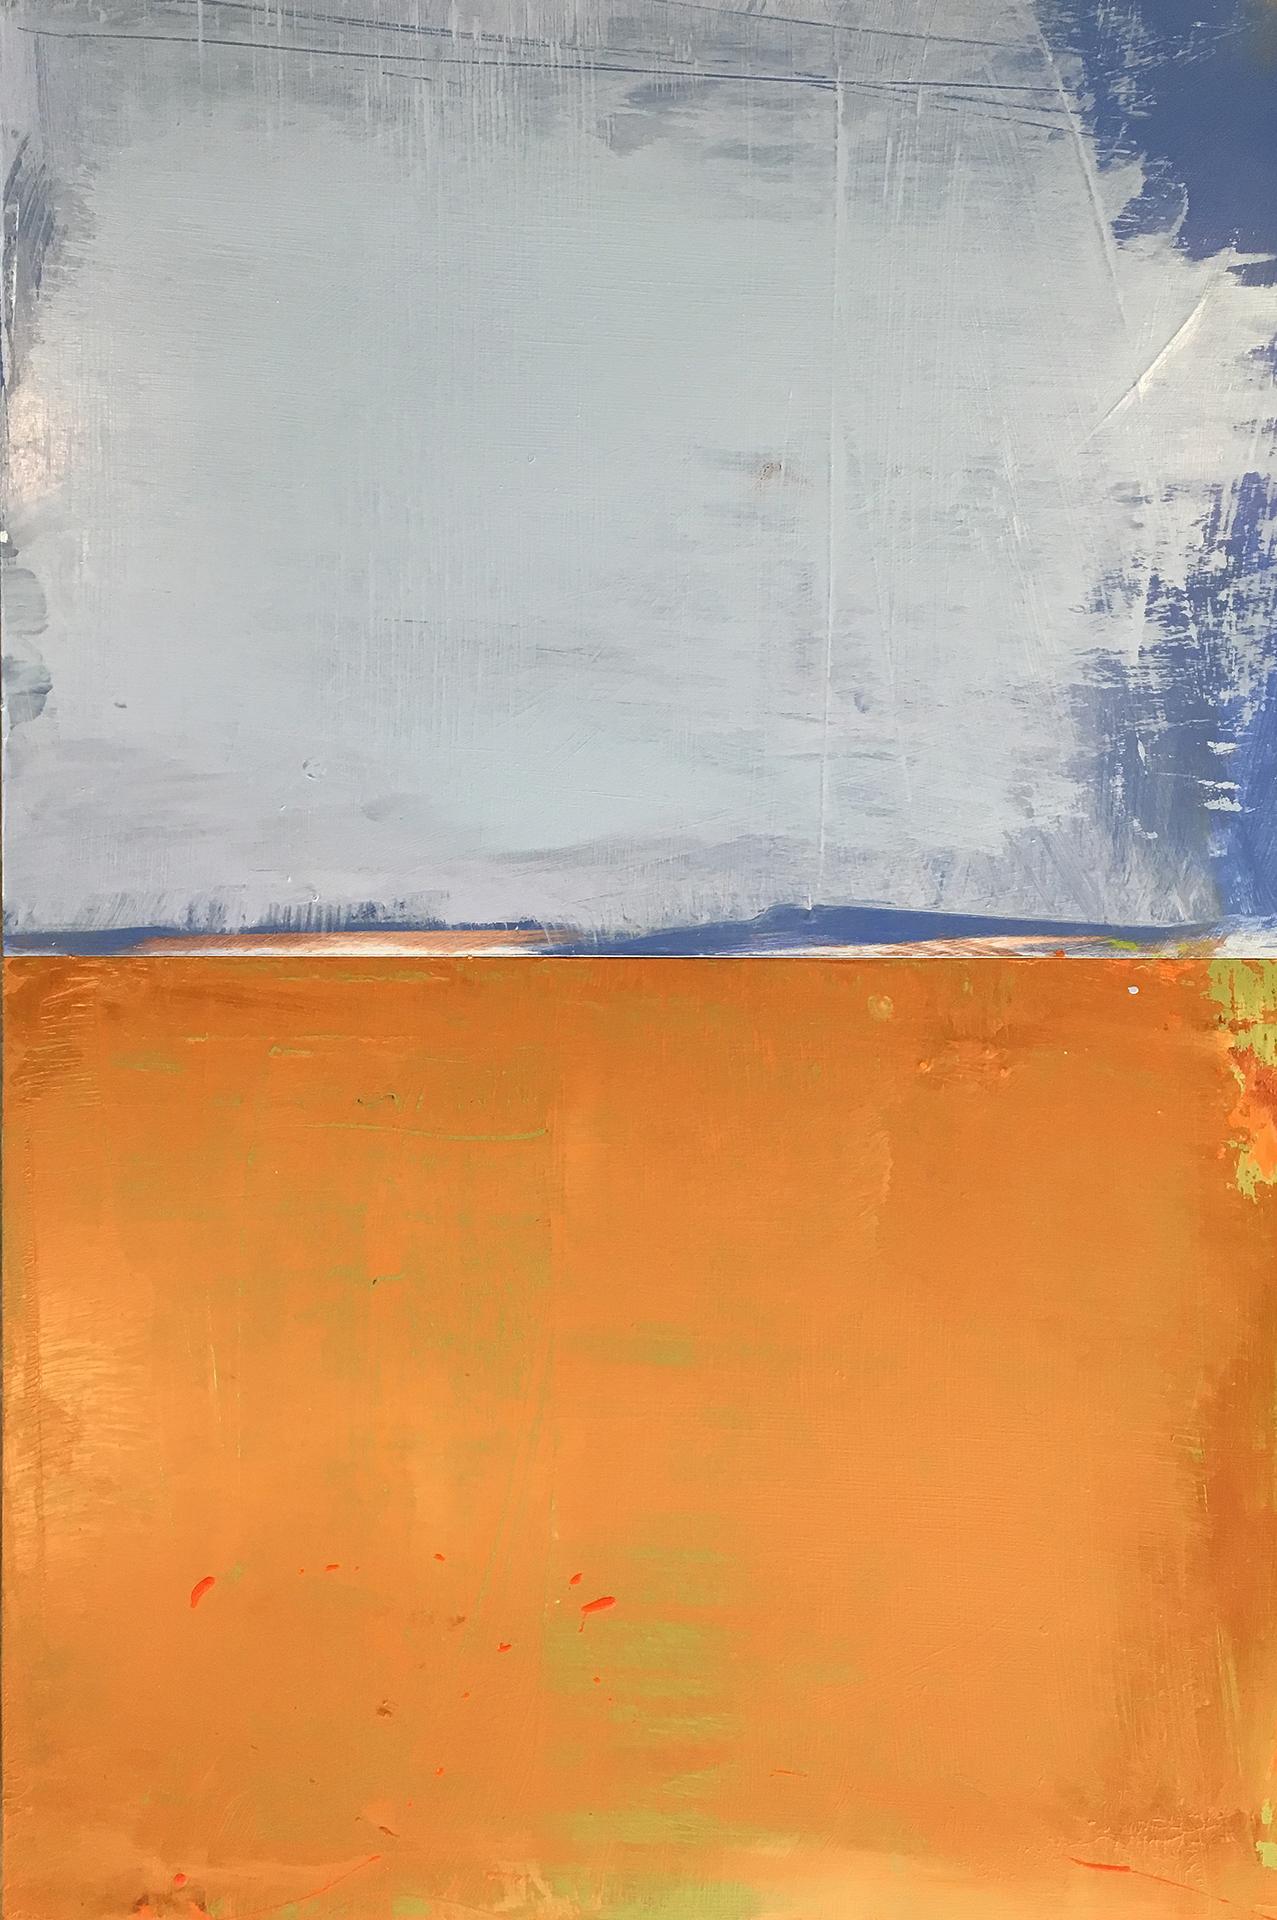 Ted Olson, Redbird, oil